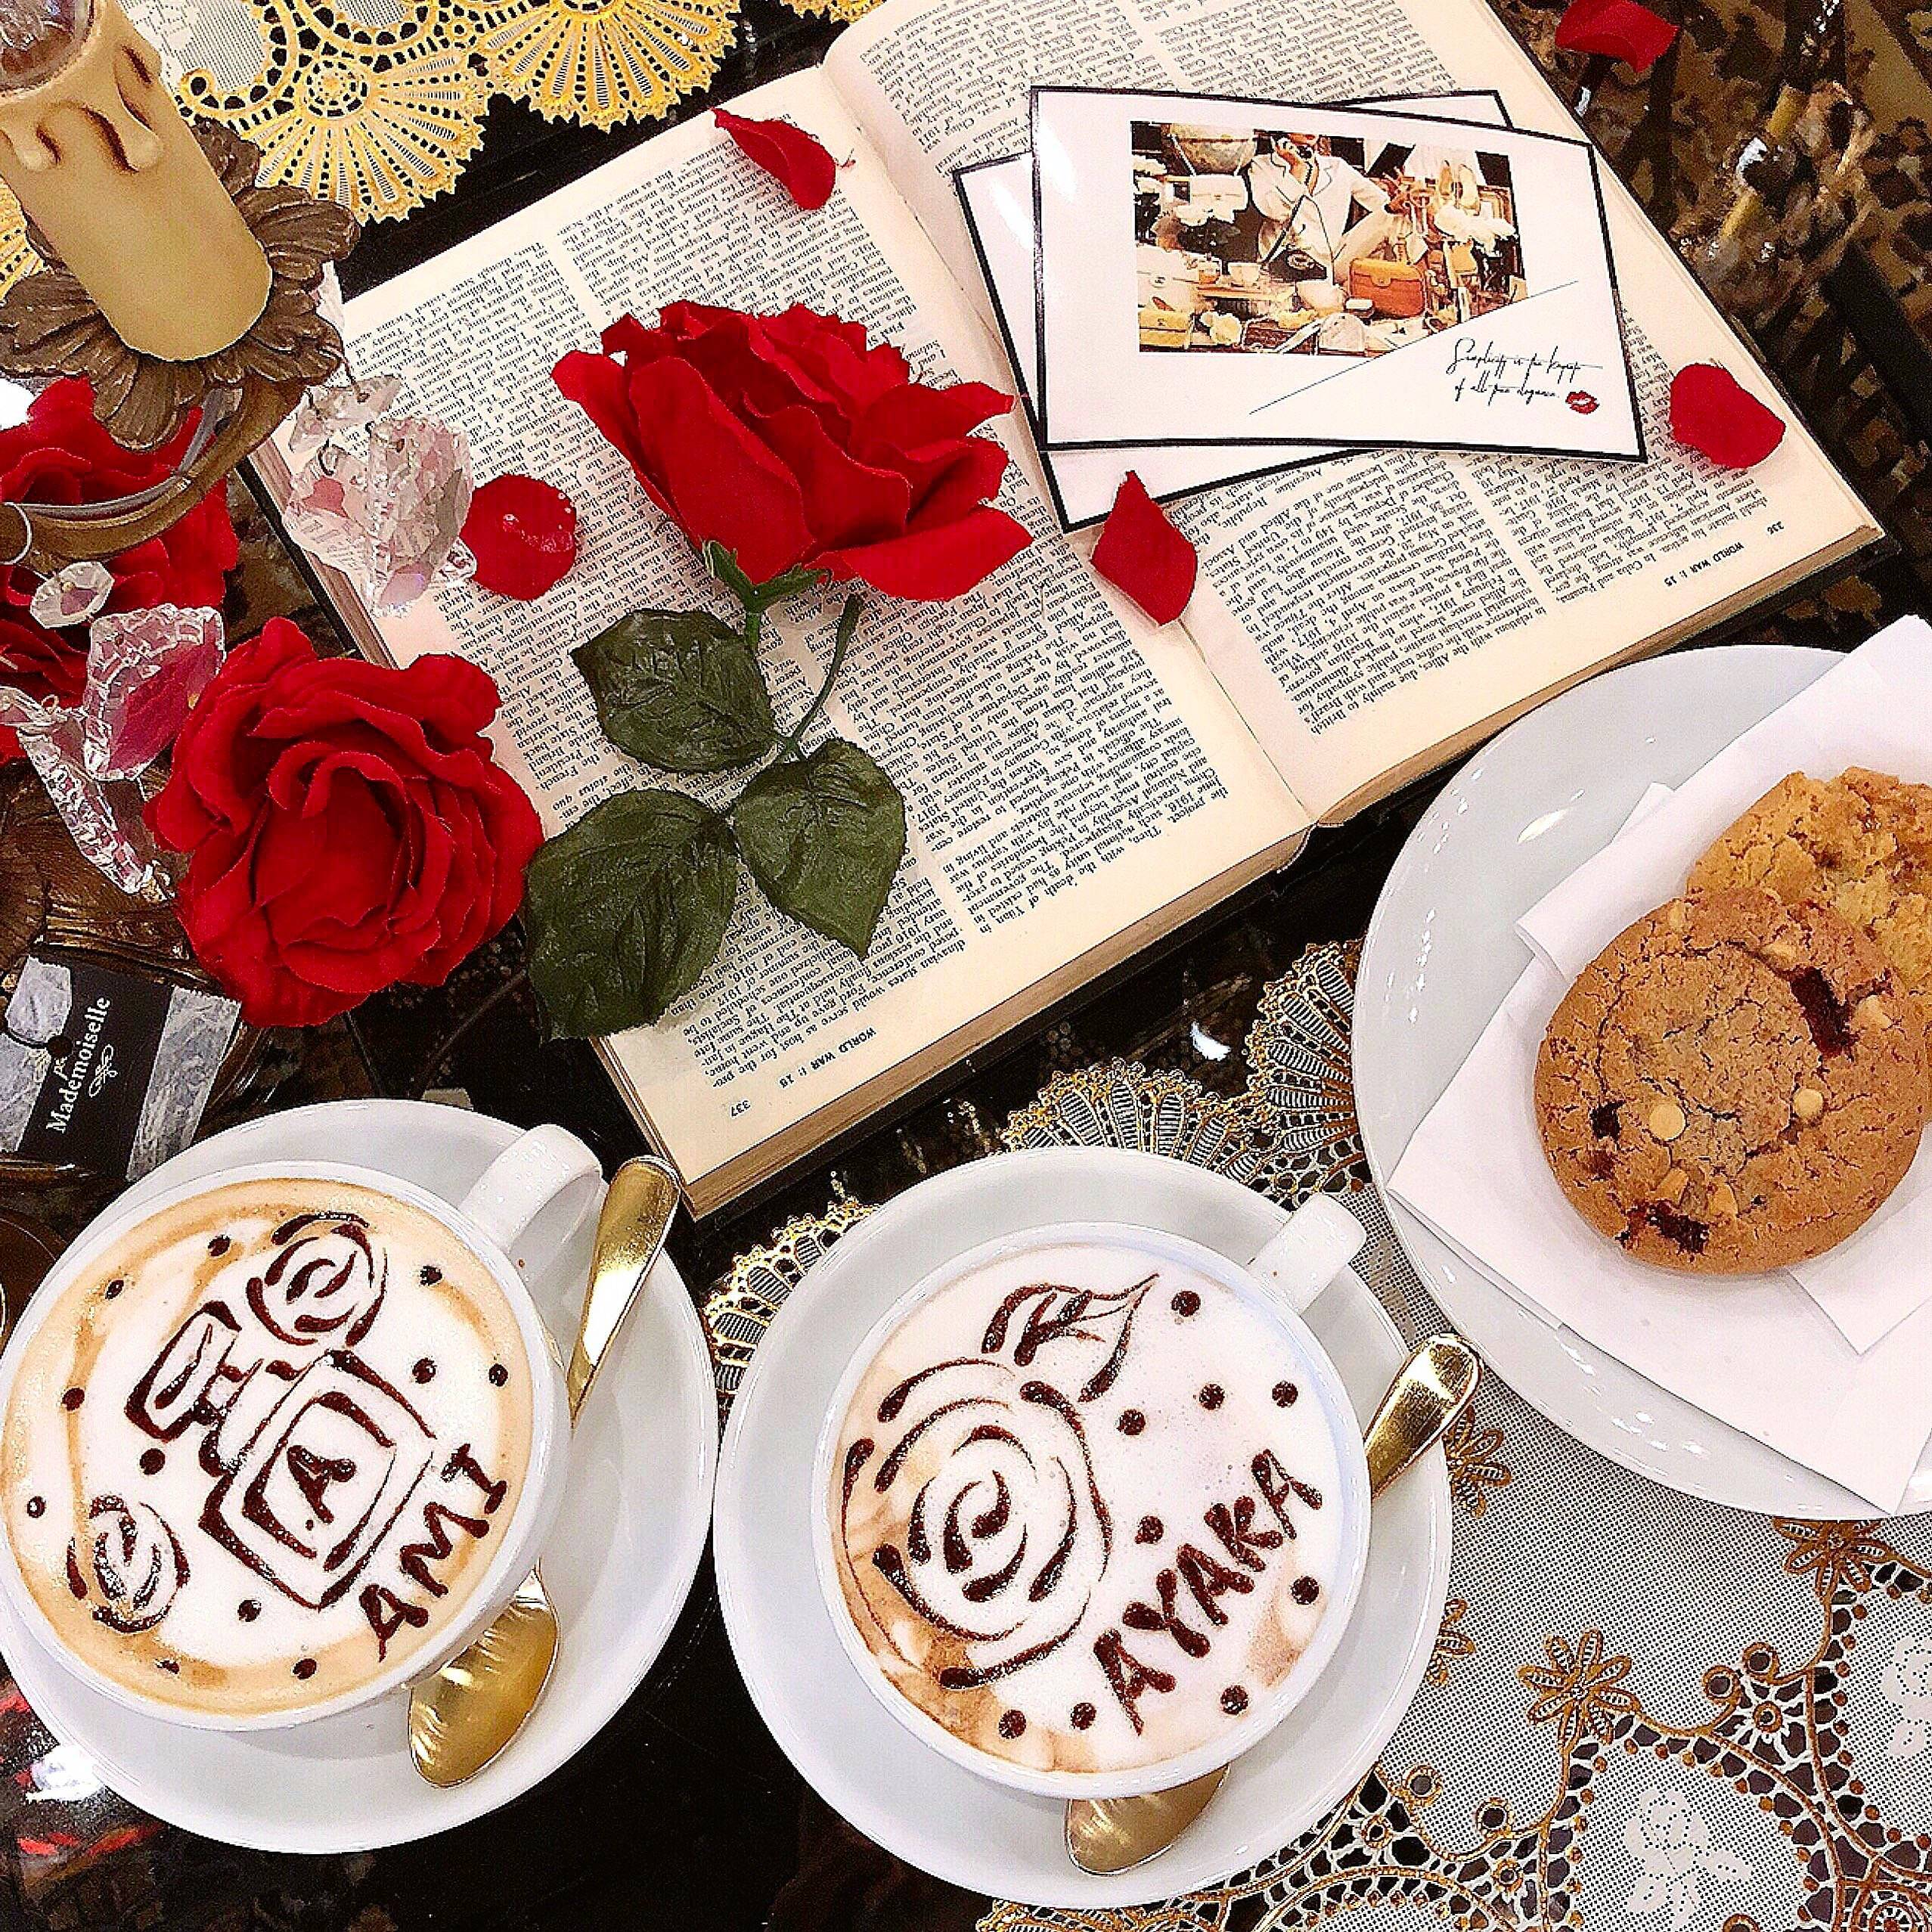 Vol.46♡ 大阪のカフェ巡りで困ったらここ!①【Mademoiselle CAFE(マドモワゼル カフェ)】_1_2